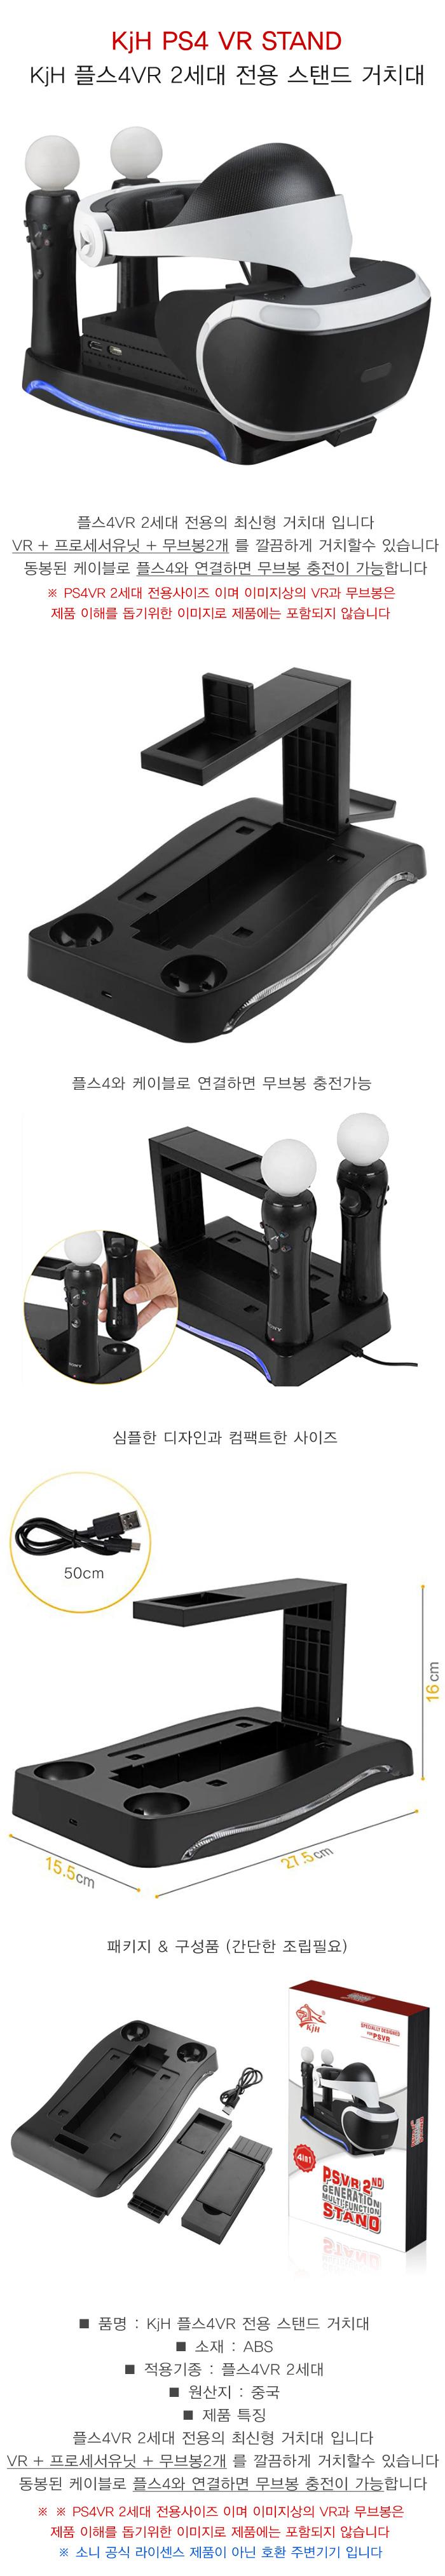 KJH 플스4VR PS4VR 전용 거치대 스탠드 - 스냅케이스, 21,800원, 게임기, 게임기 액세서리